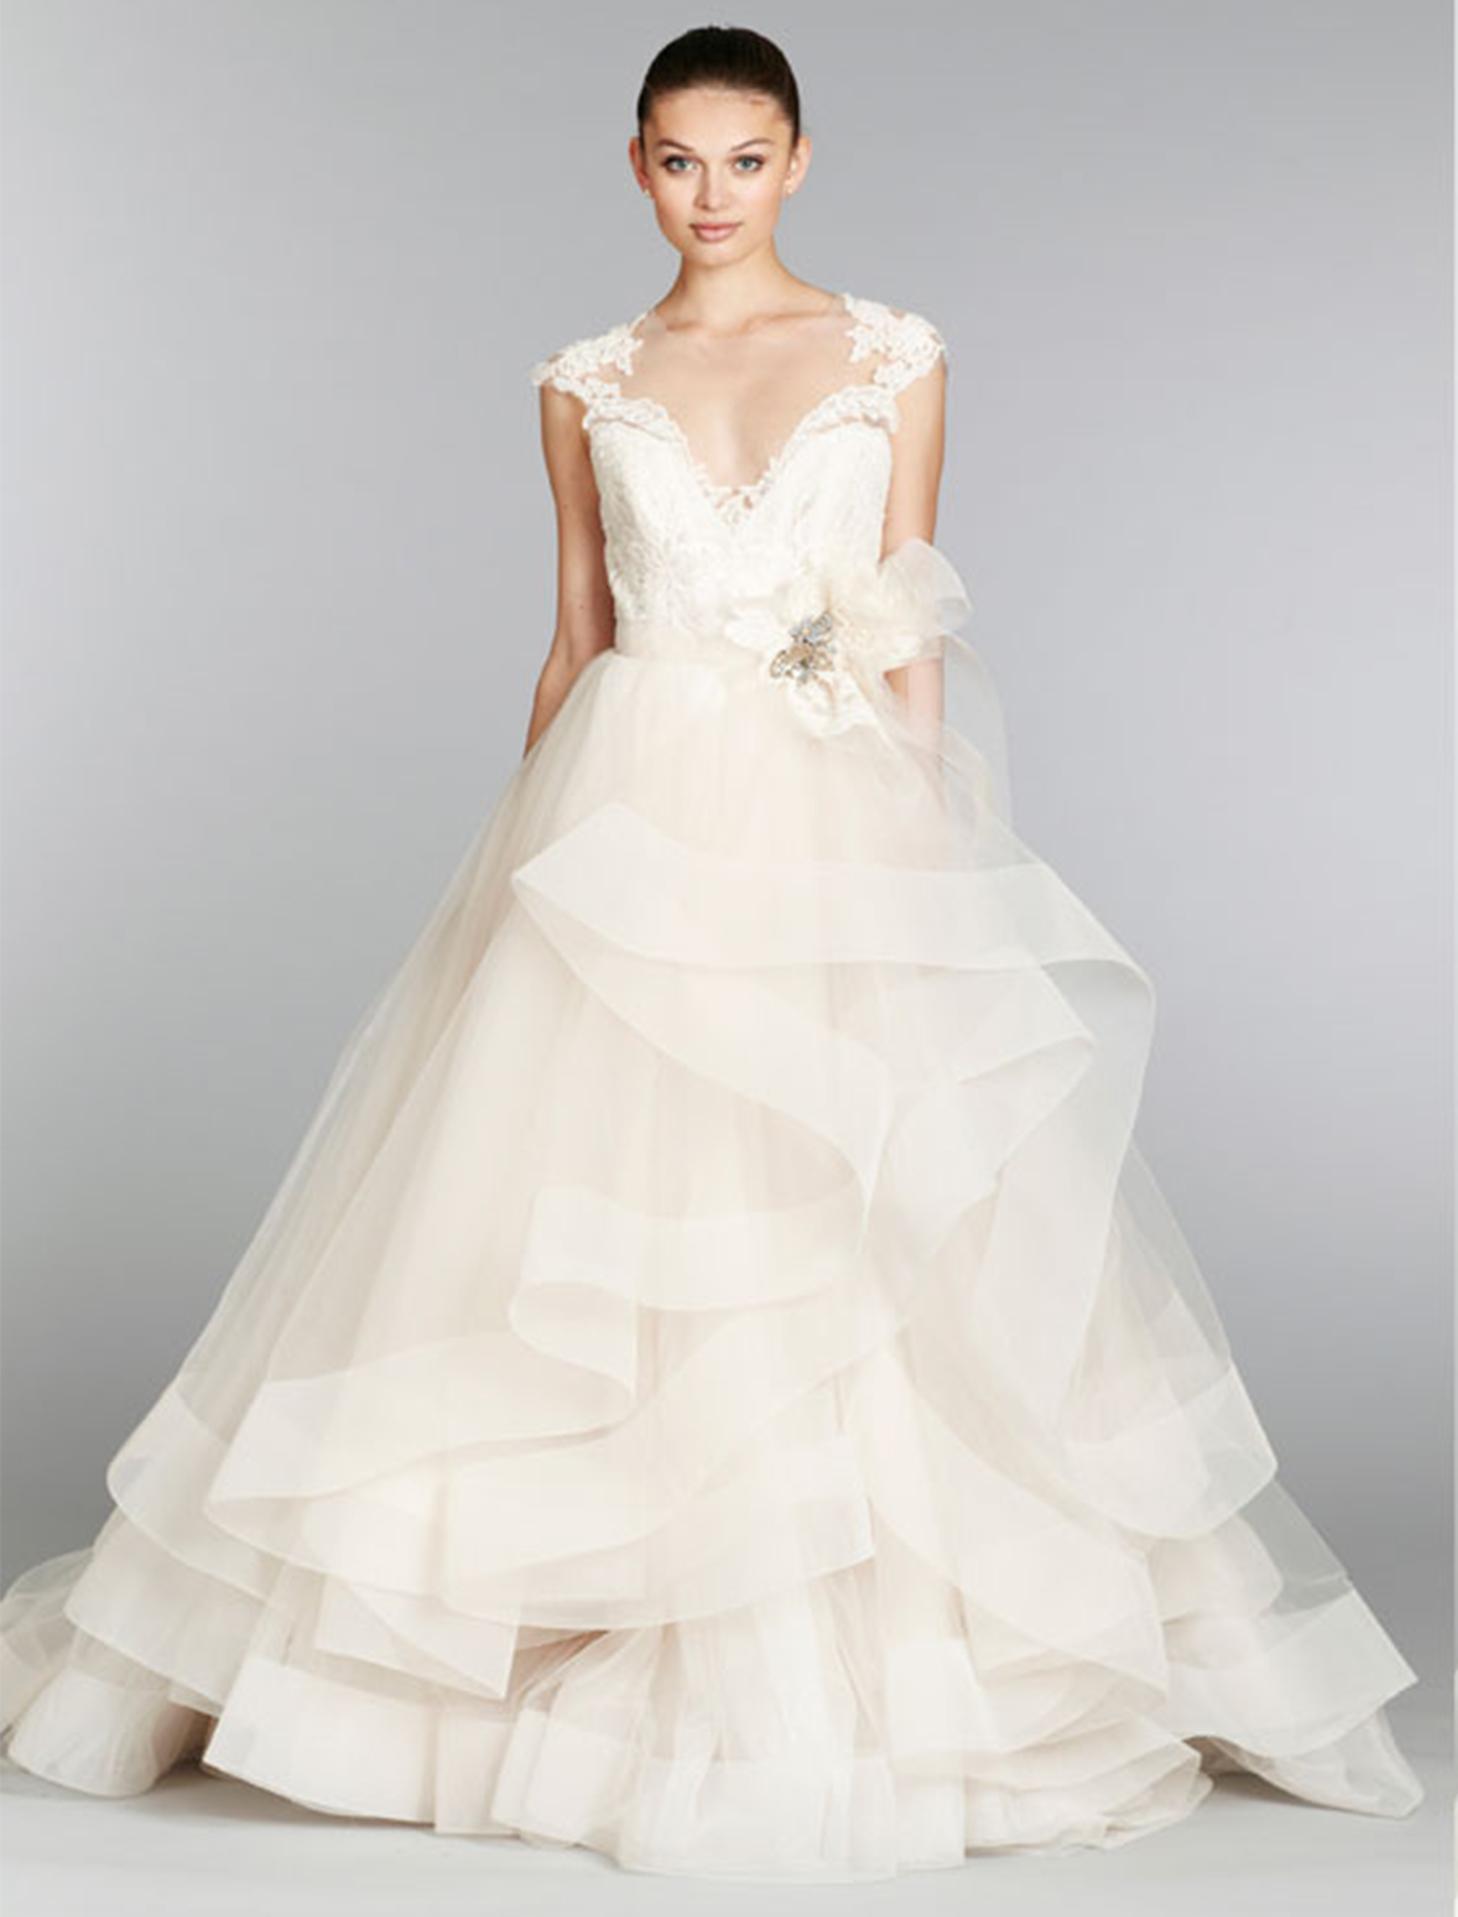 Ball gown wedding dress kleinfeld bridal for Kleinfeld wedding dress designers